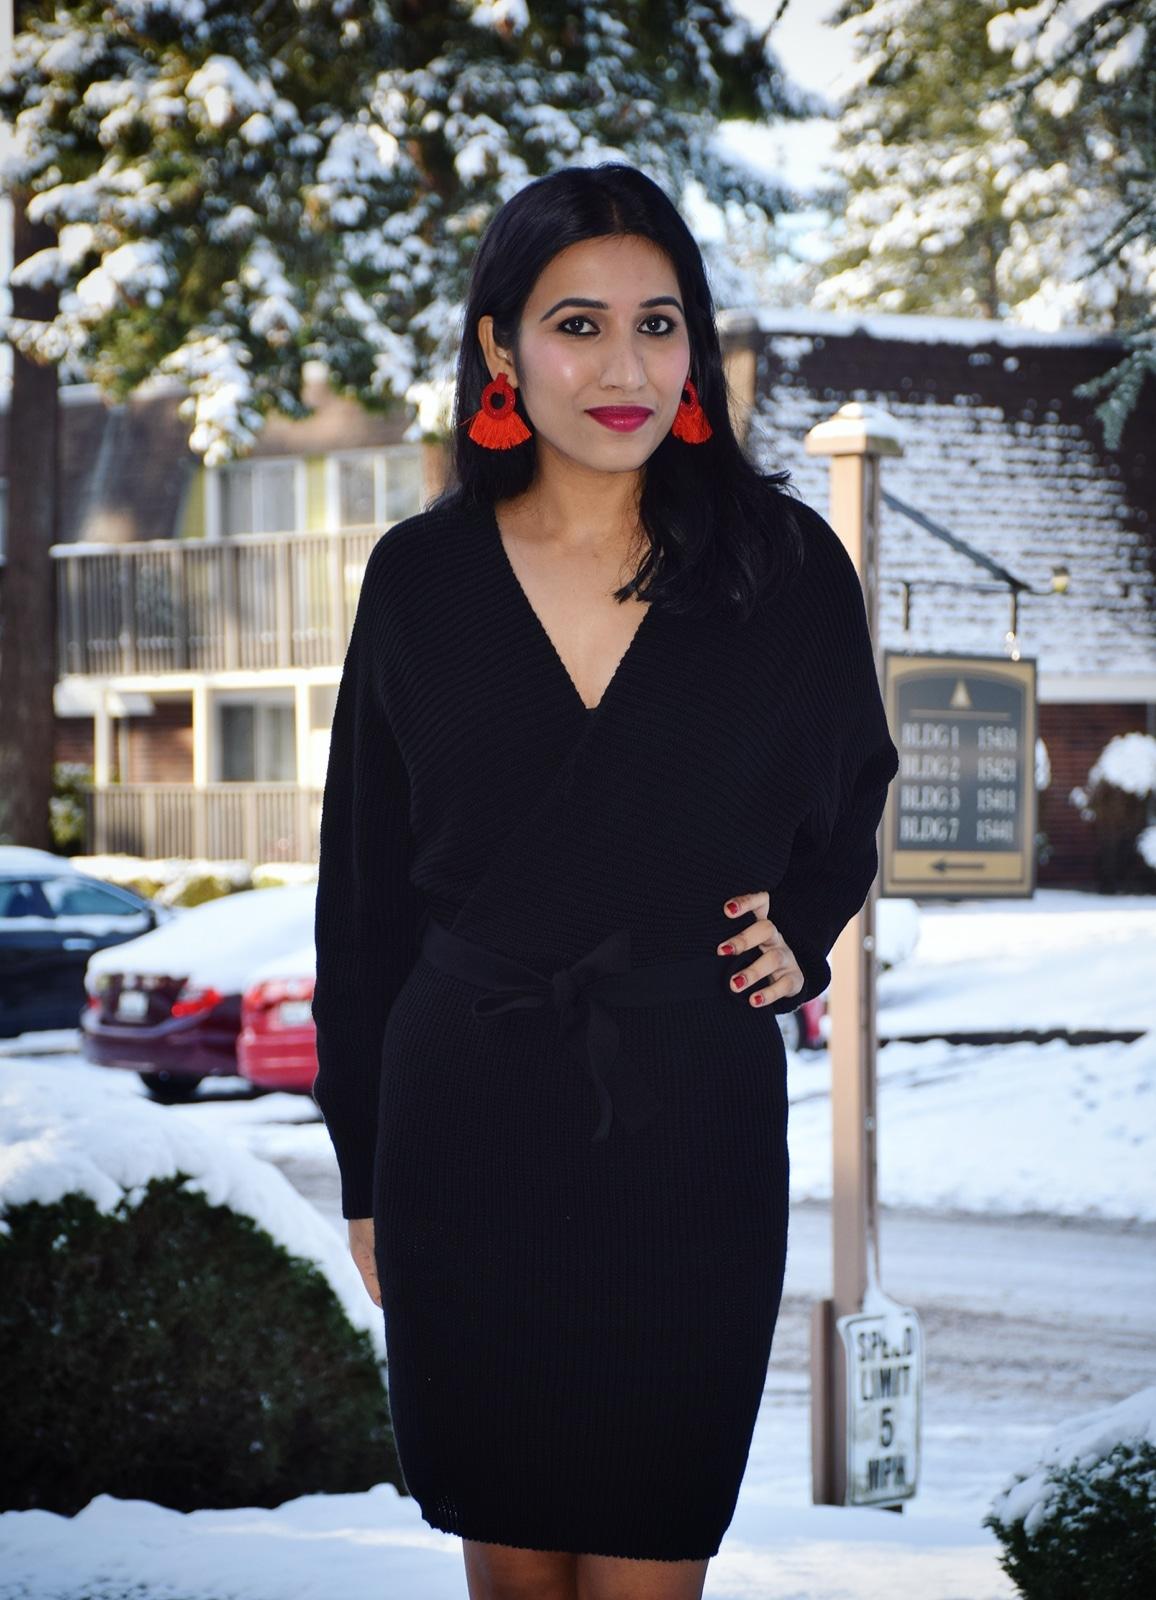 https://femmeluxefinery.co.uk/products/black-knit-long-sleeve-tie-front-wrap-dress-star